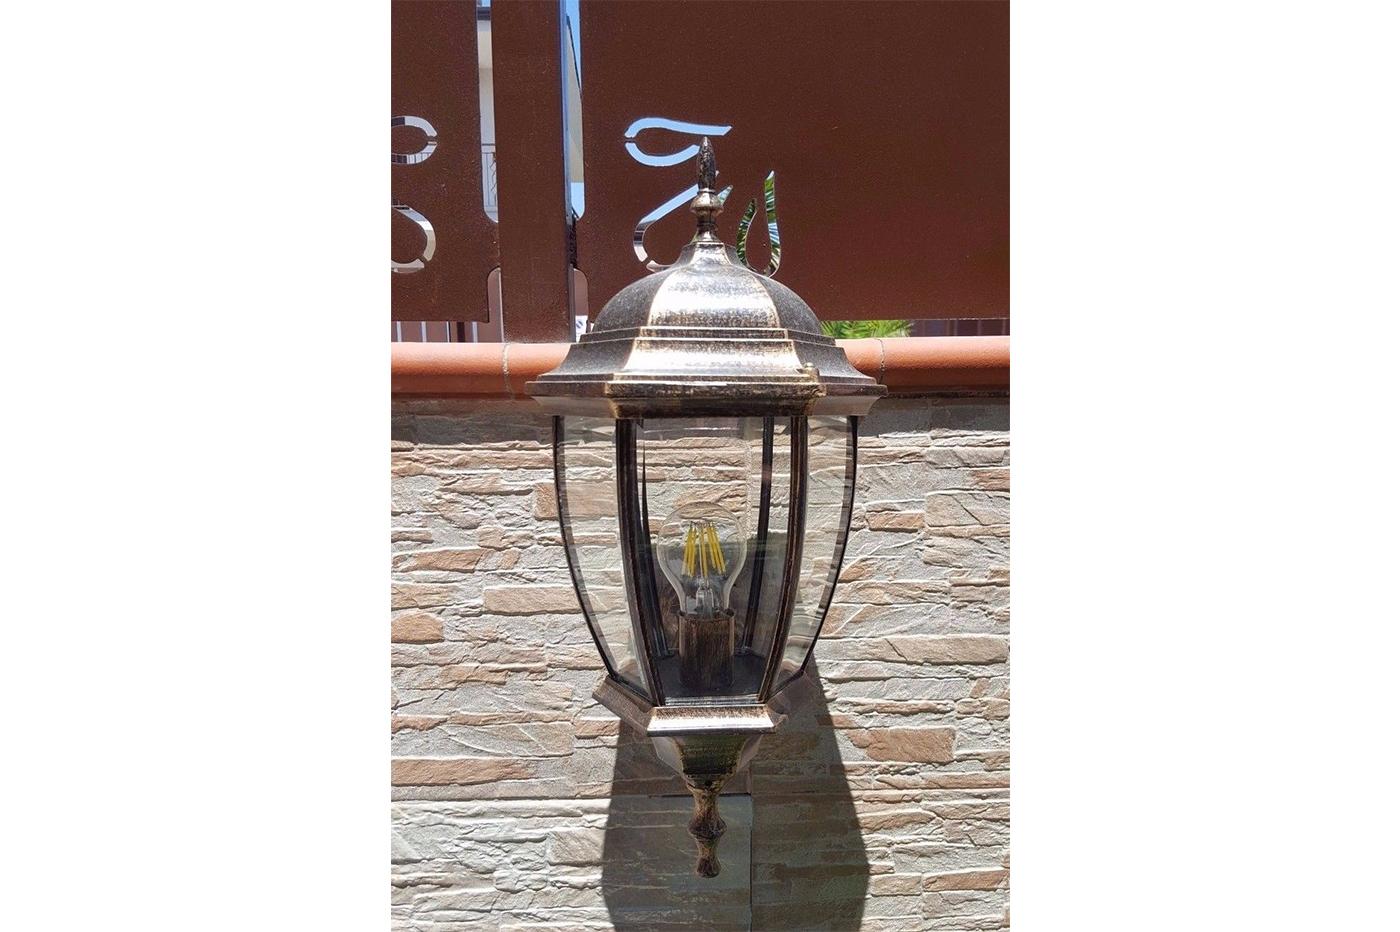 Bes 24887 applique beselettronica applique lampada lanterna